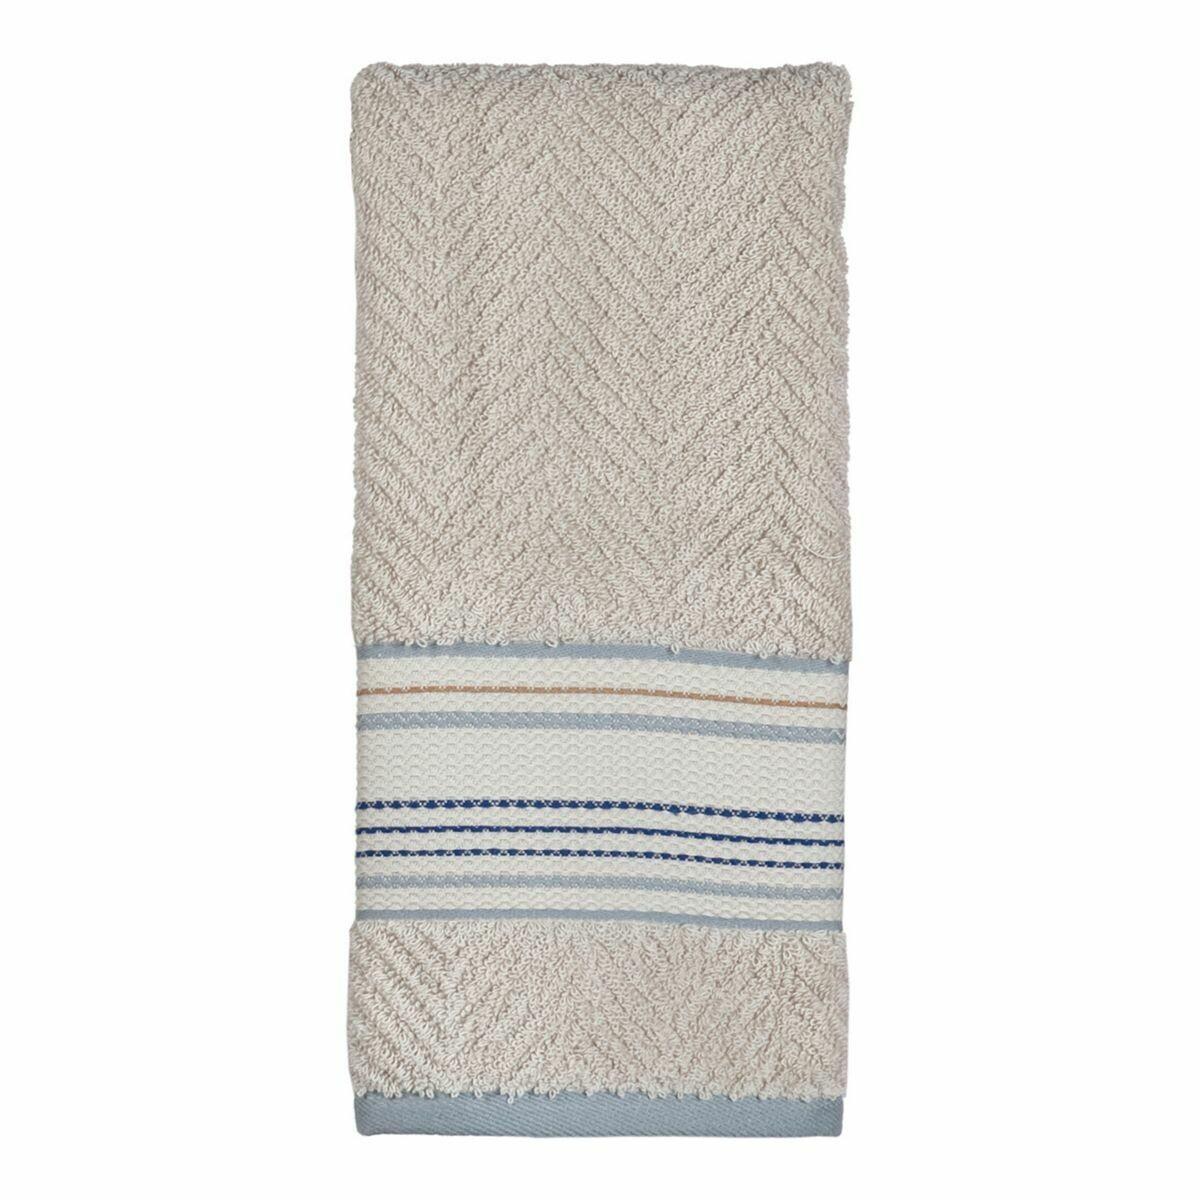 Ticking Stripe Wash Cloth